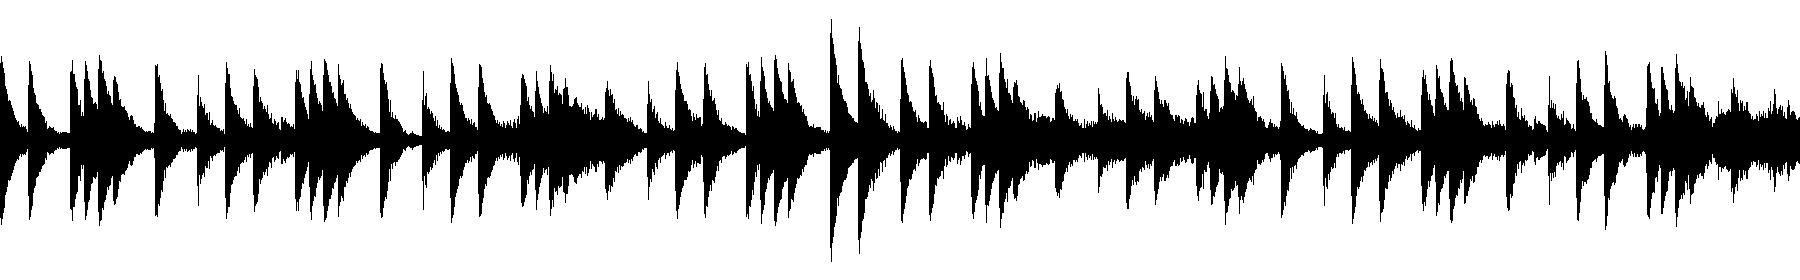 zttc synth loop 10 g 126 bpm